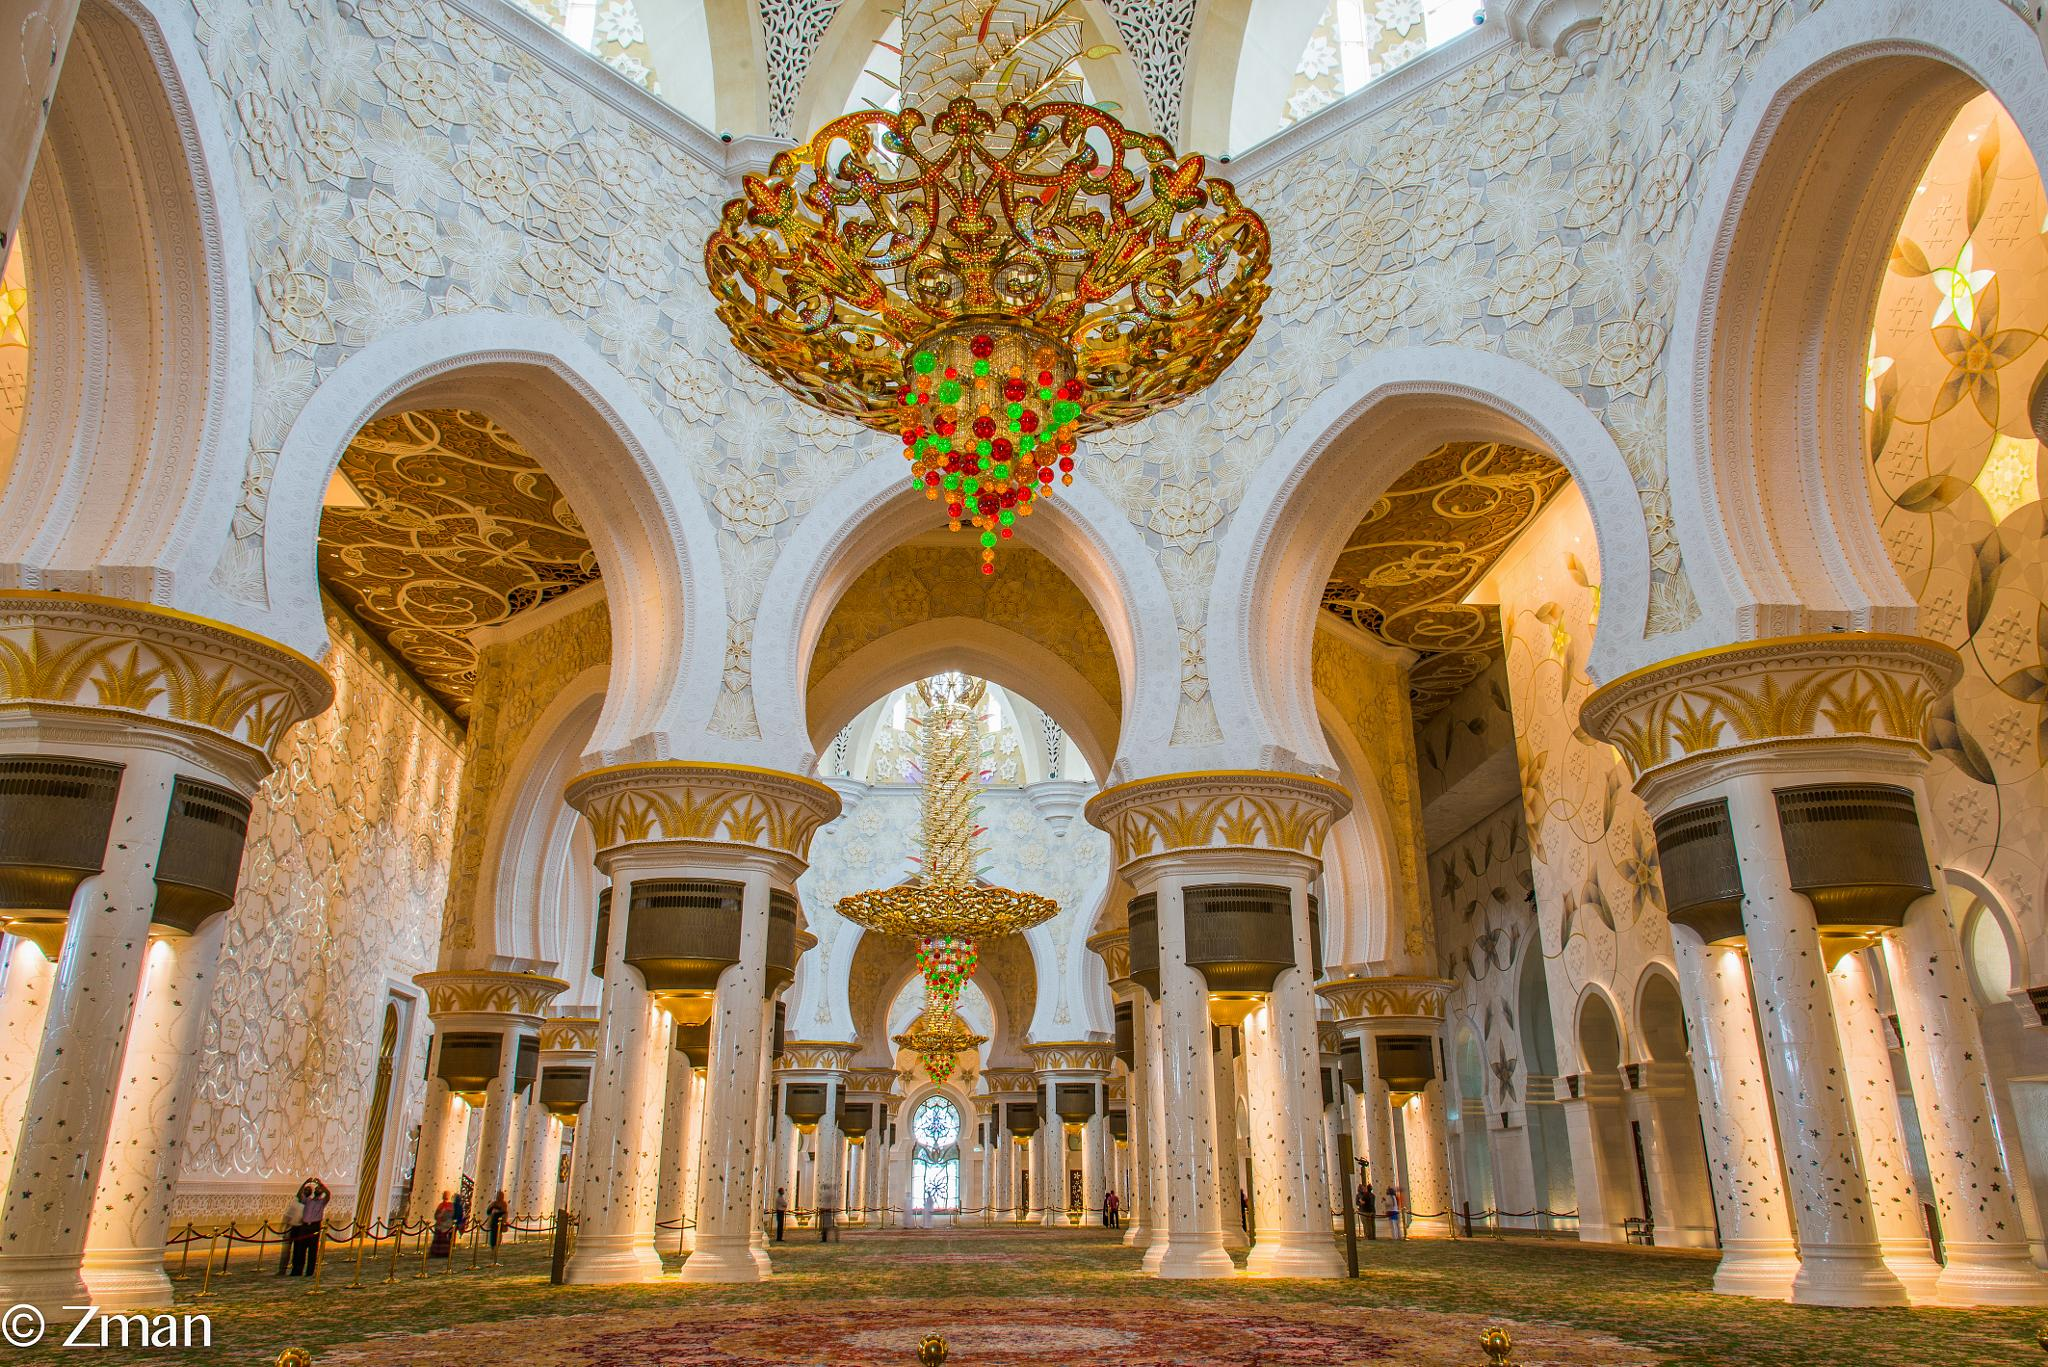 Main Prayer Room of Shk. Zayed Mosque by muhammad.nasser.963